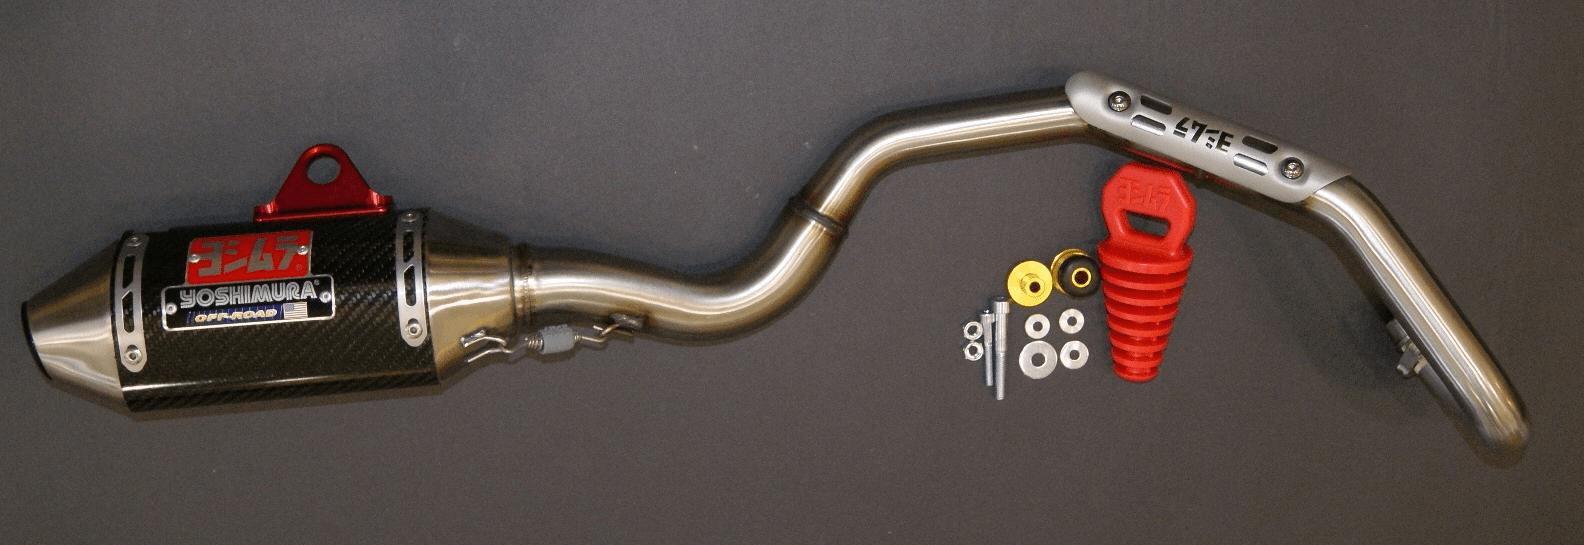 yoshimura rs 2 ss carbon exhaust system for klx110 klx110l